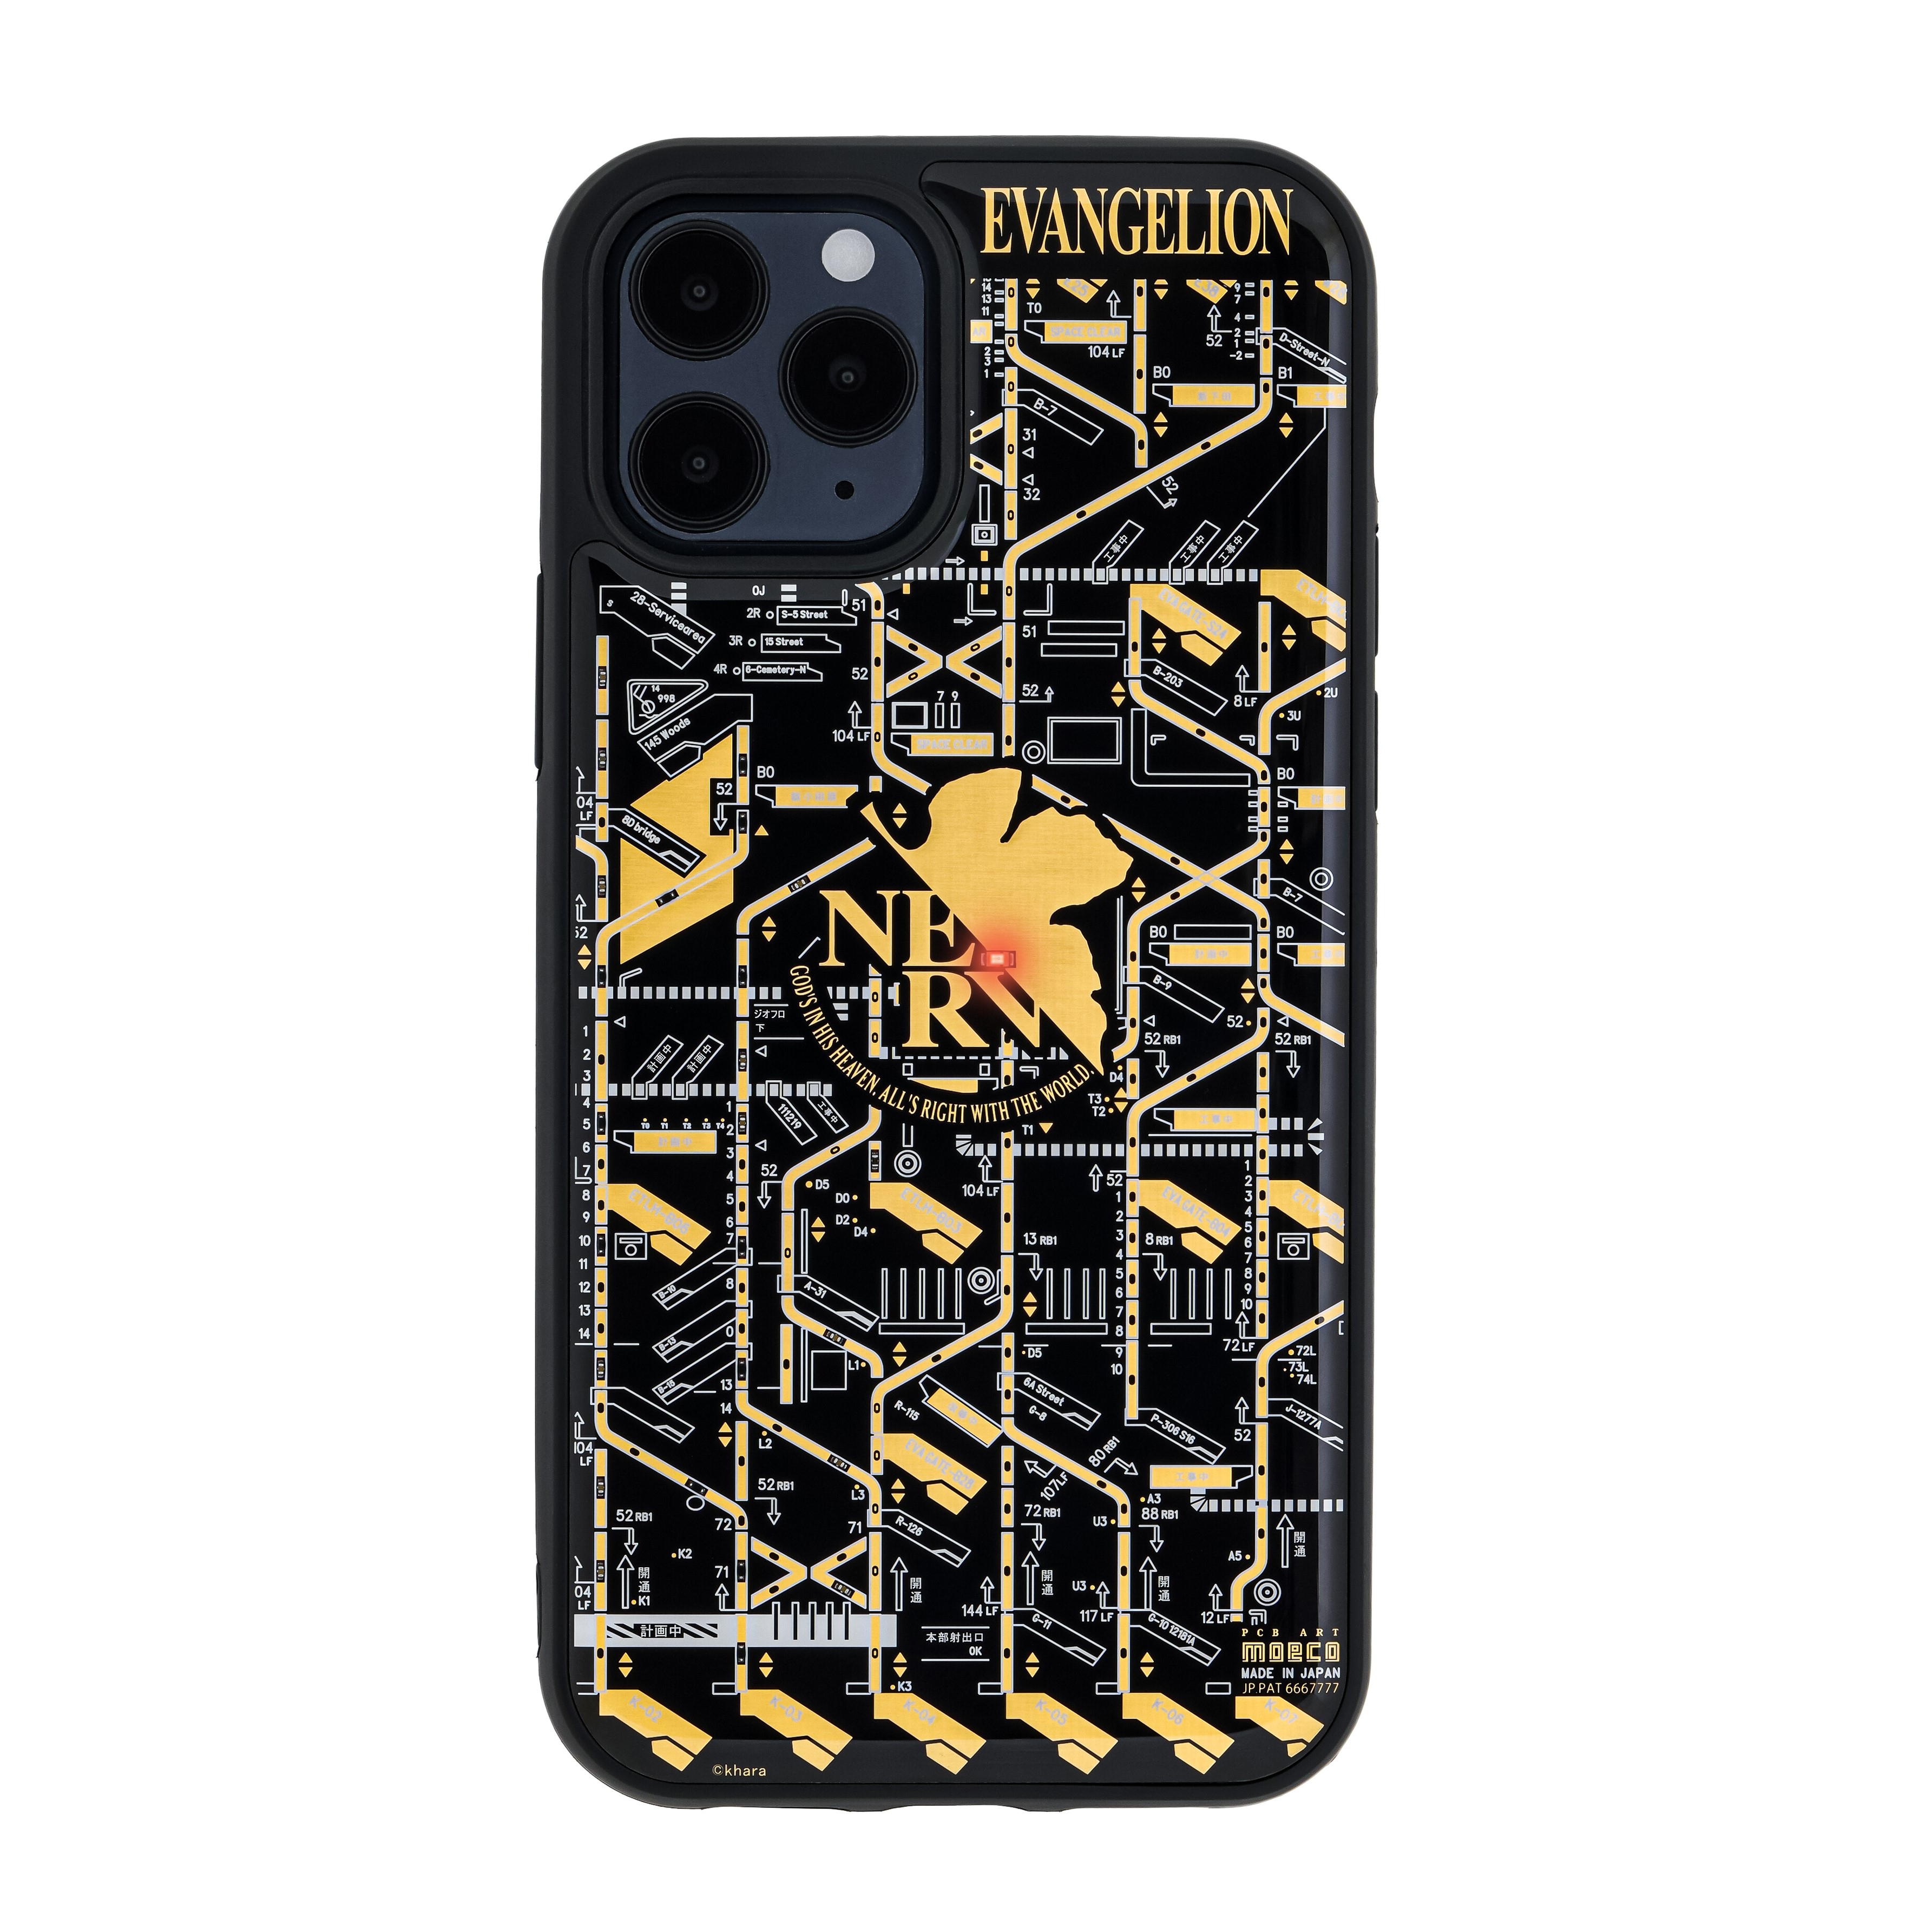 FLASH NERV 基板アート iPhone 12 / 12 Pro ケース 黒【東京回路線図A5クリアファイルをプレゼント】